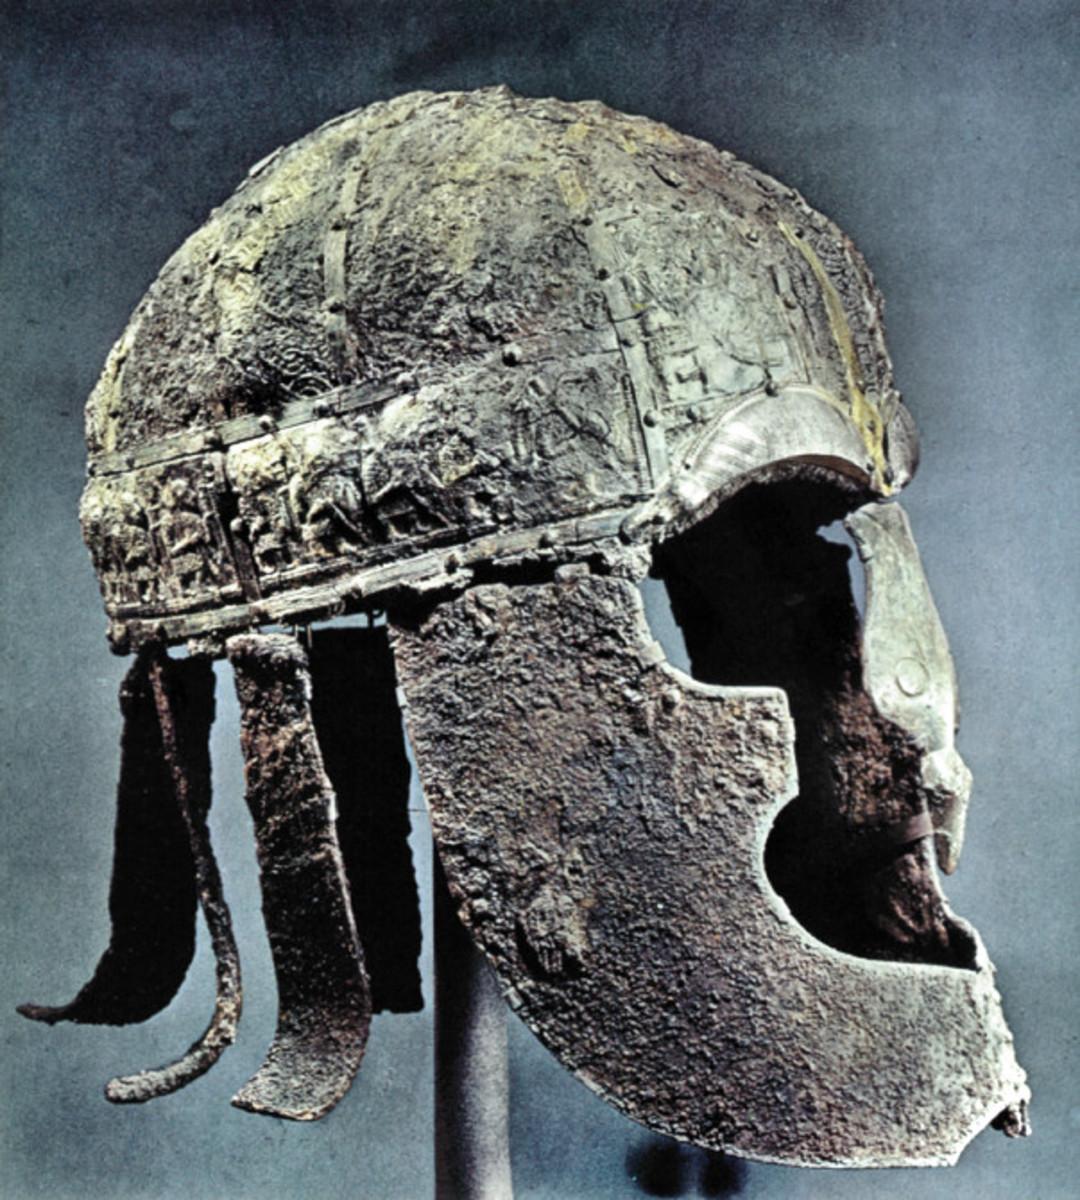 Danelaw Years - 10: Hrolf 'Kraki', Fated and Feted Warrior King - Origins of the Saga